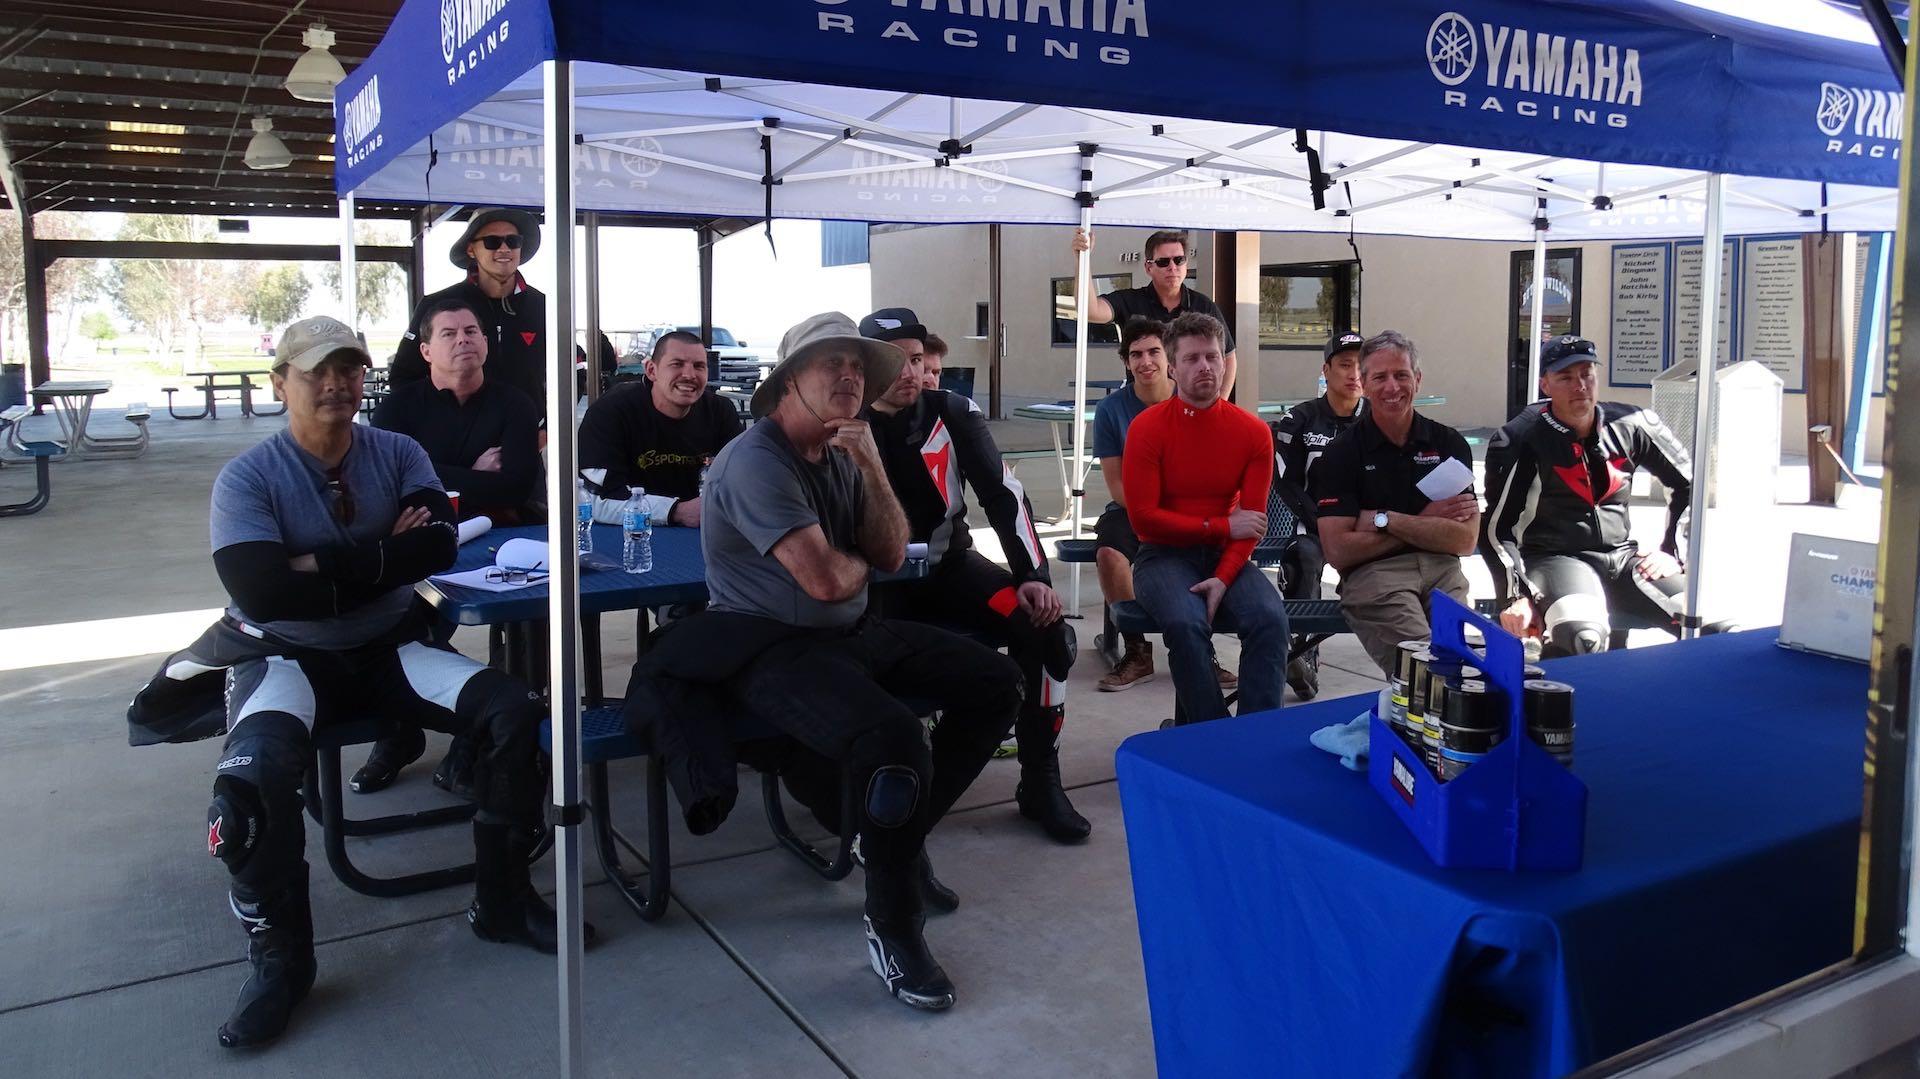 Yamaha Champions Riding School outdoor school